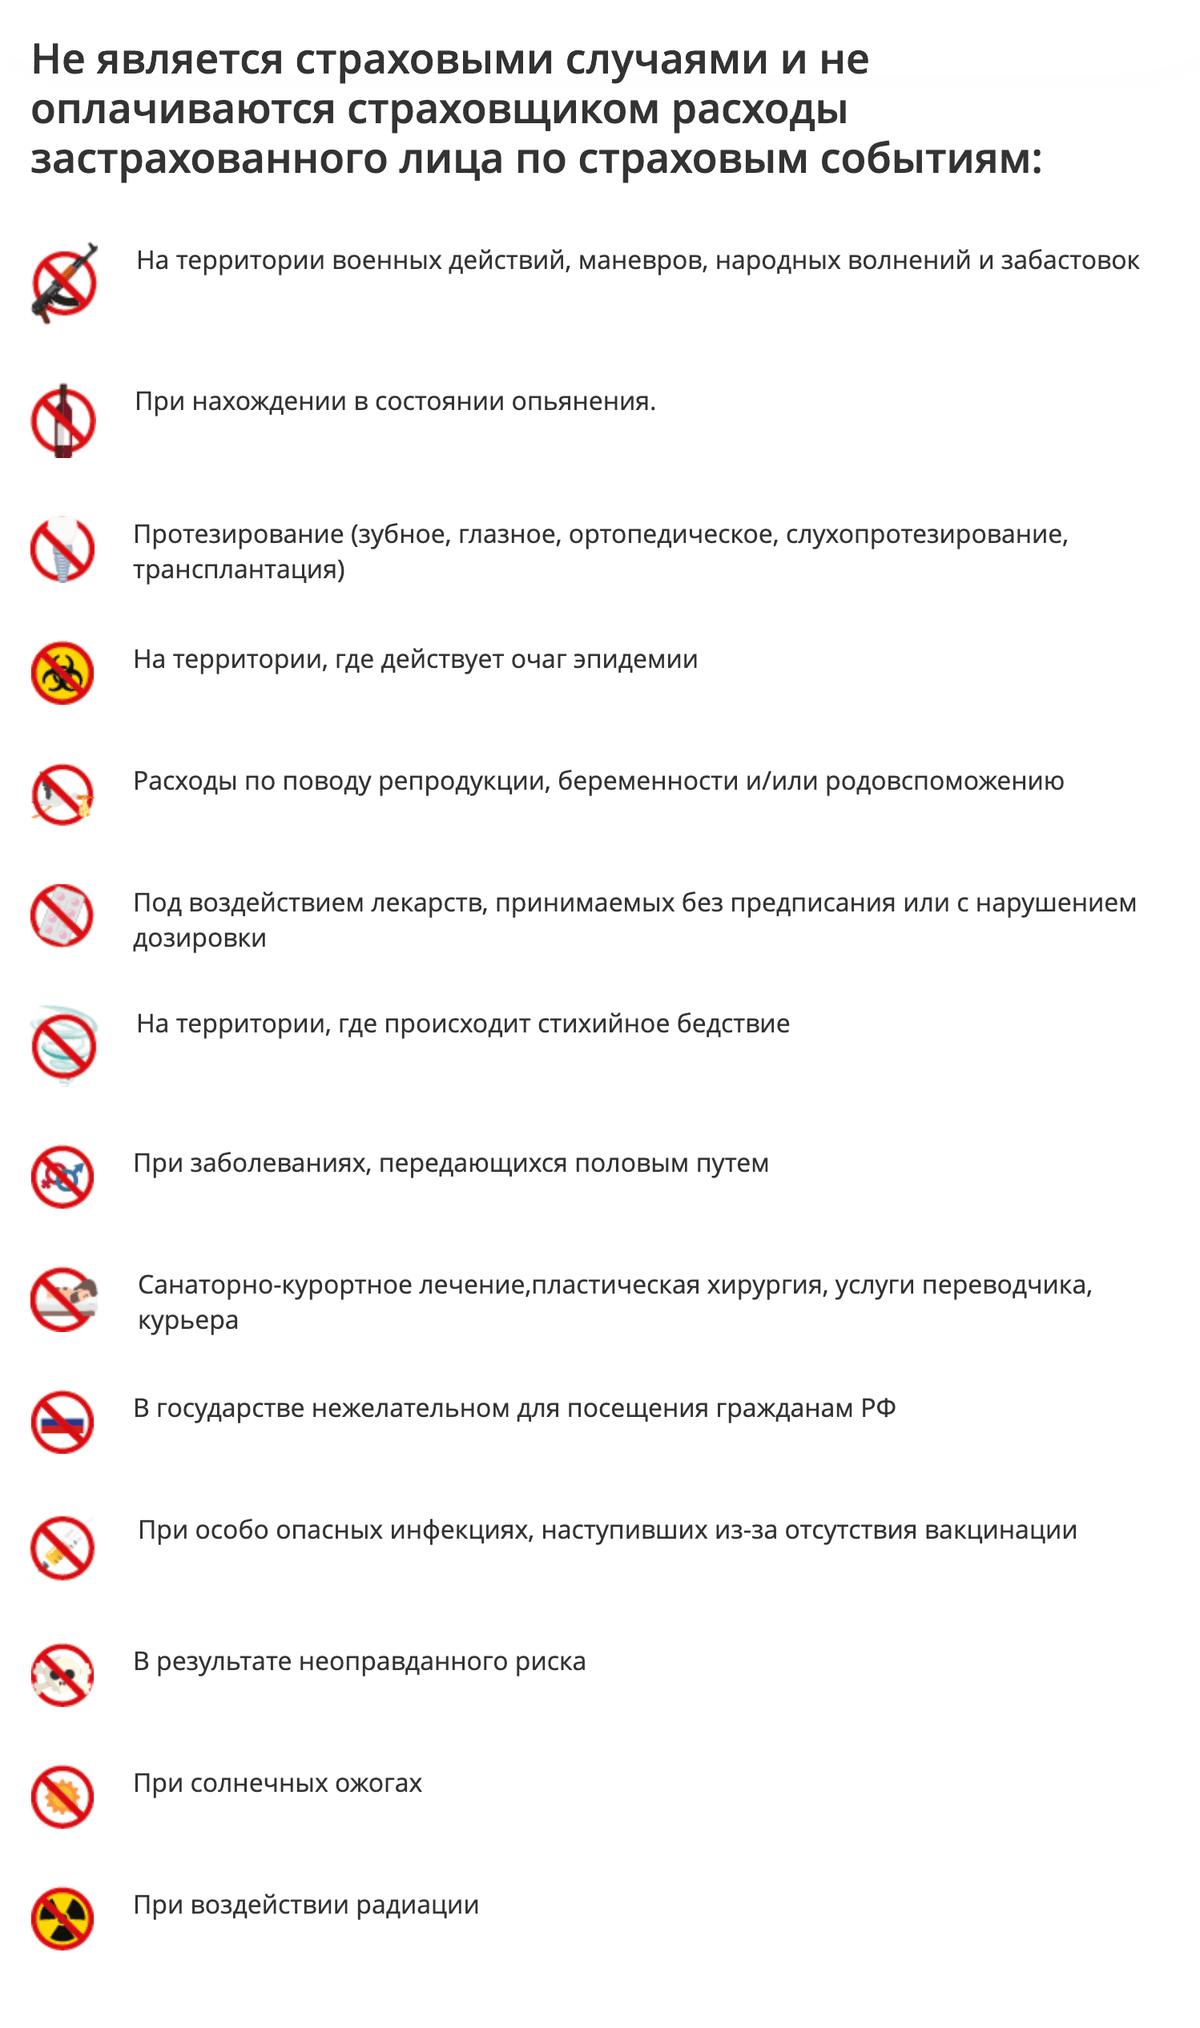 Правила на сайте «Согласия»